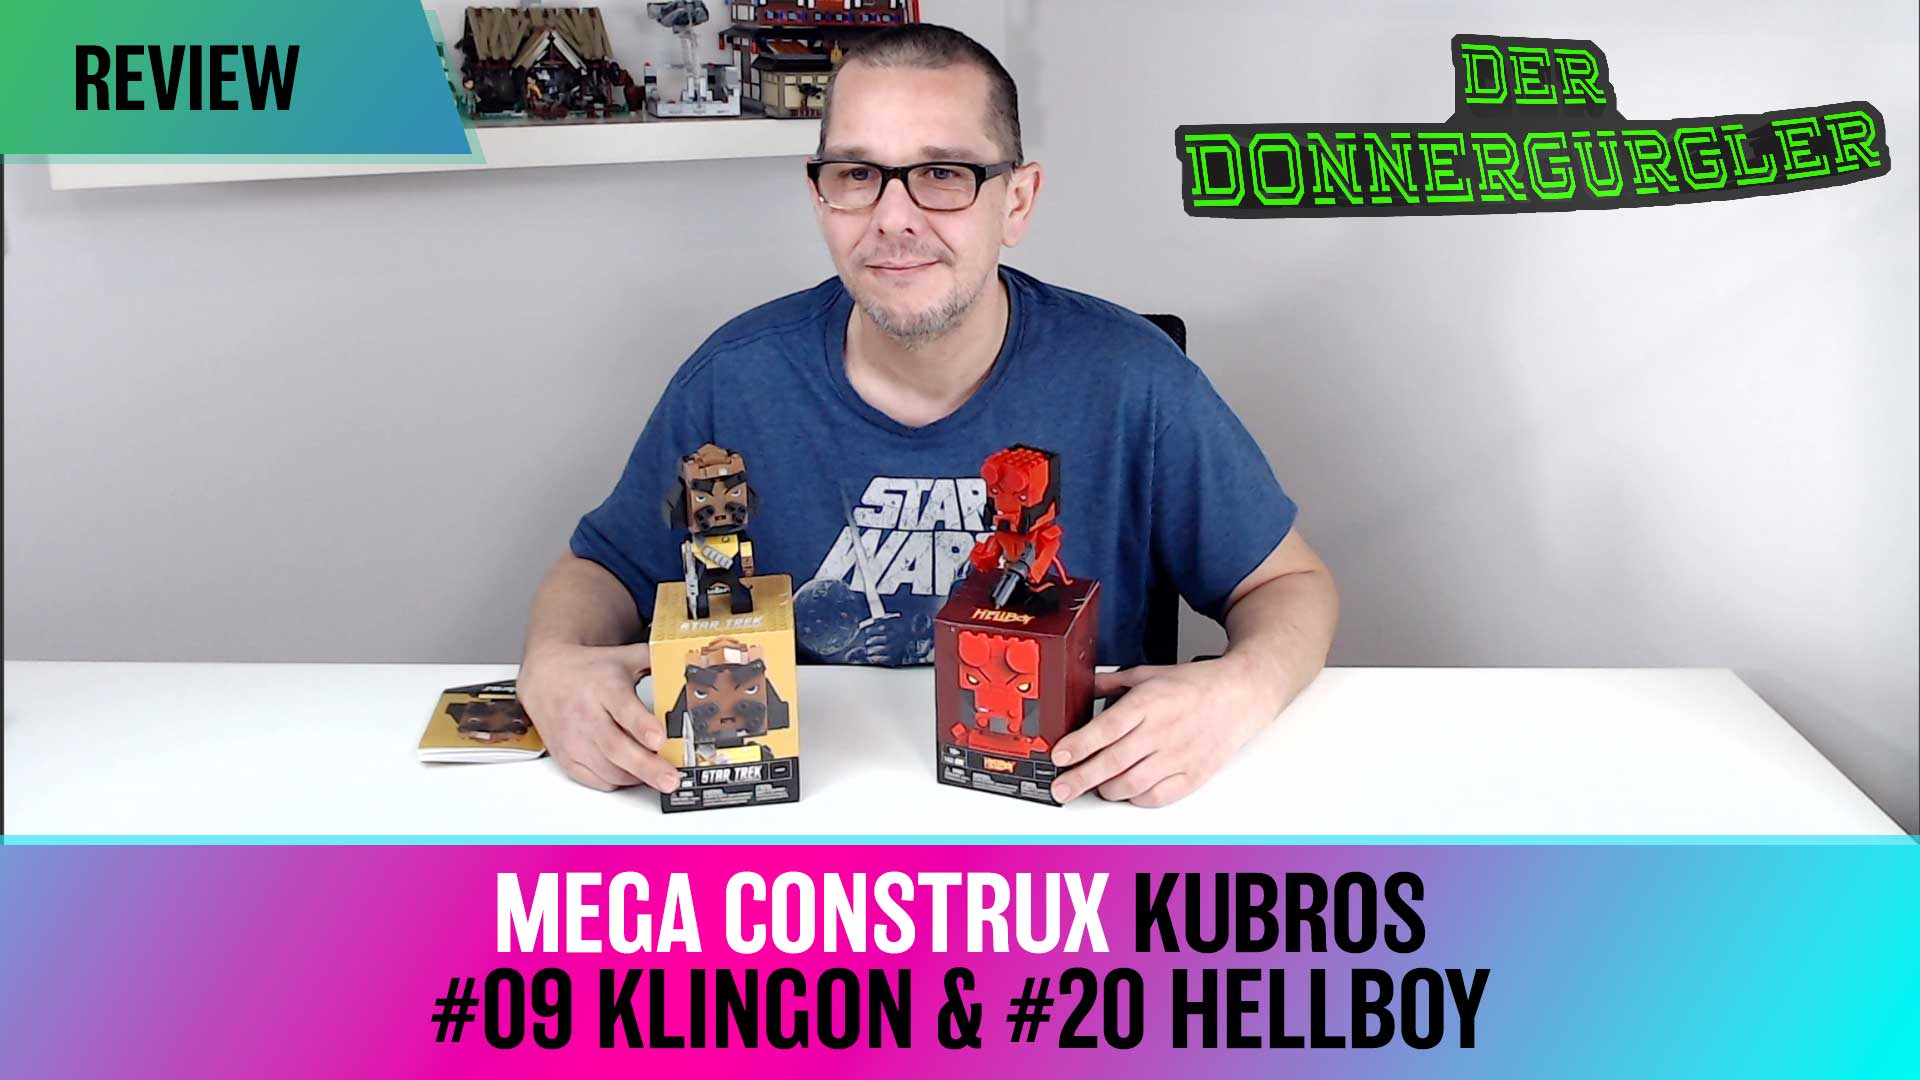 Kubros Figur #09 Star Trek Klingon & #20 Hellboy von Mega Construx